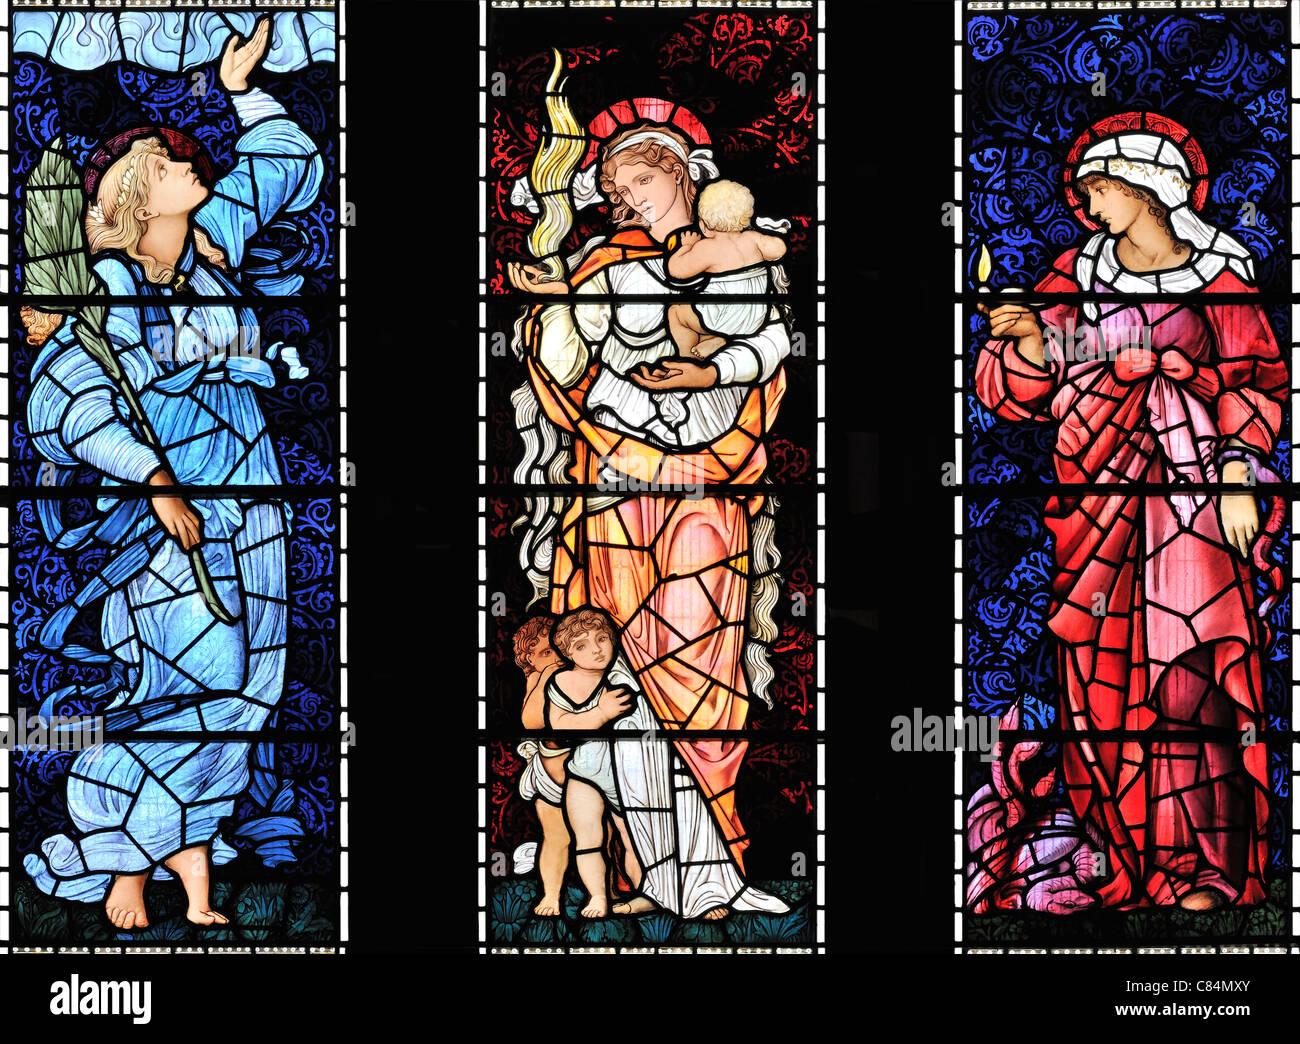 The Three Virtues, Faith (right), Hope (left) and Charity, St Martin's Church, Brampton, Cumbria, England - Stock Image